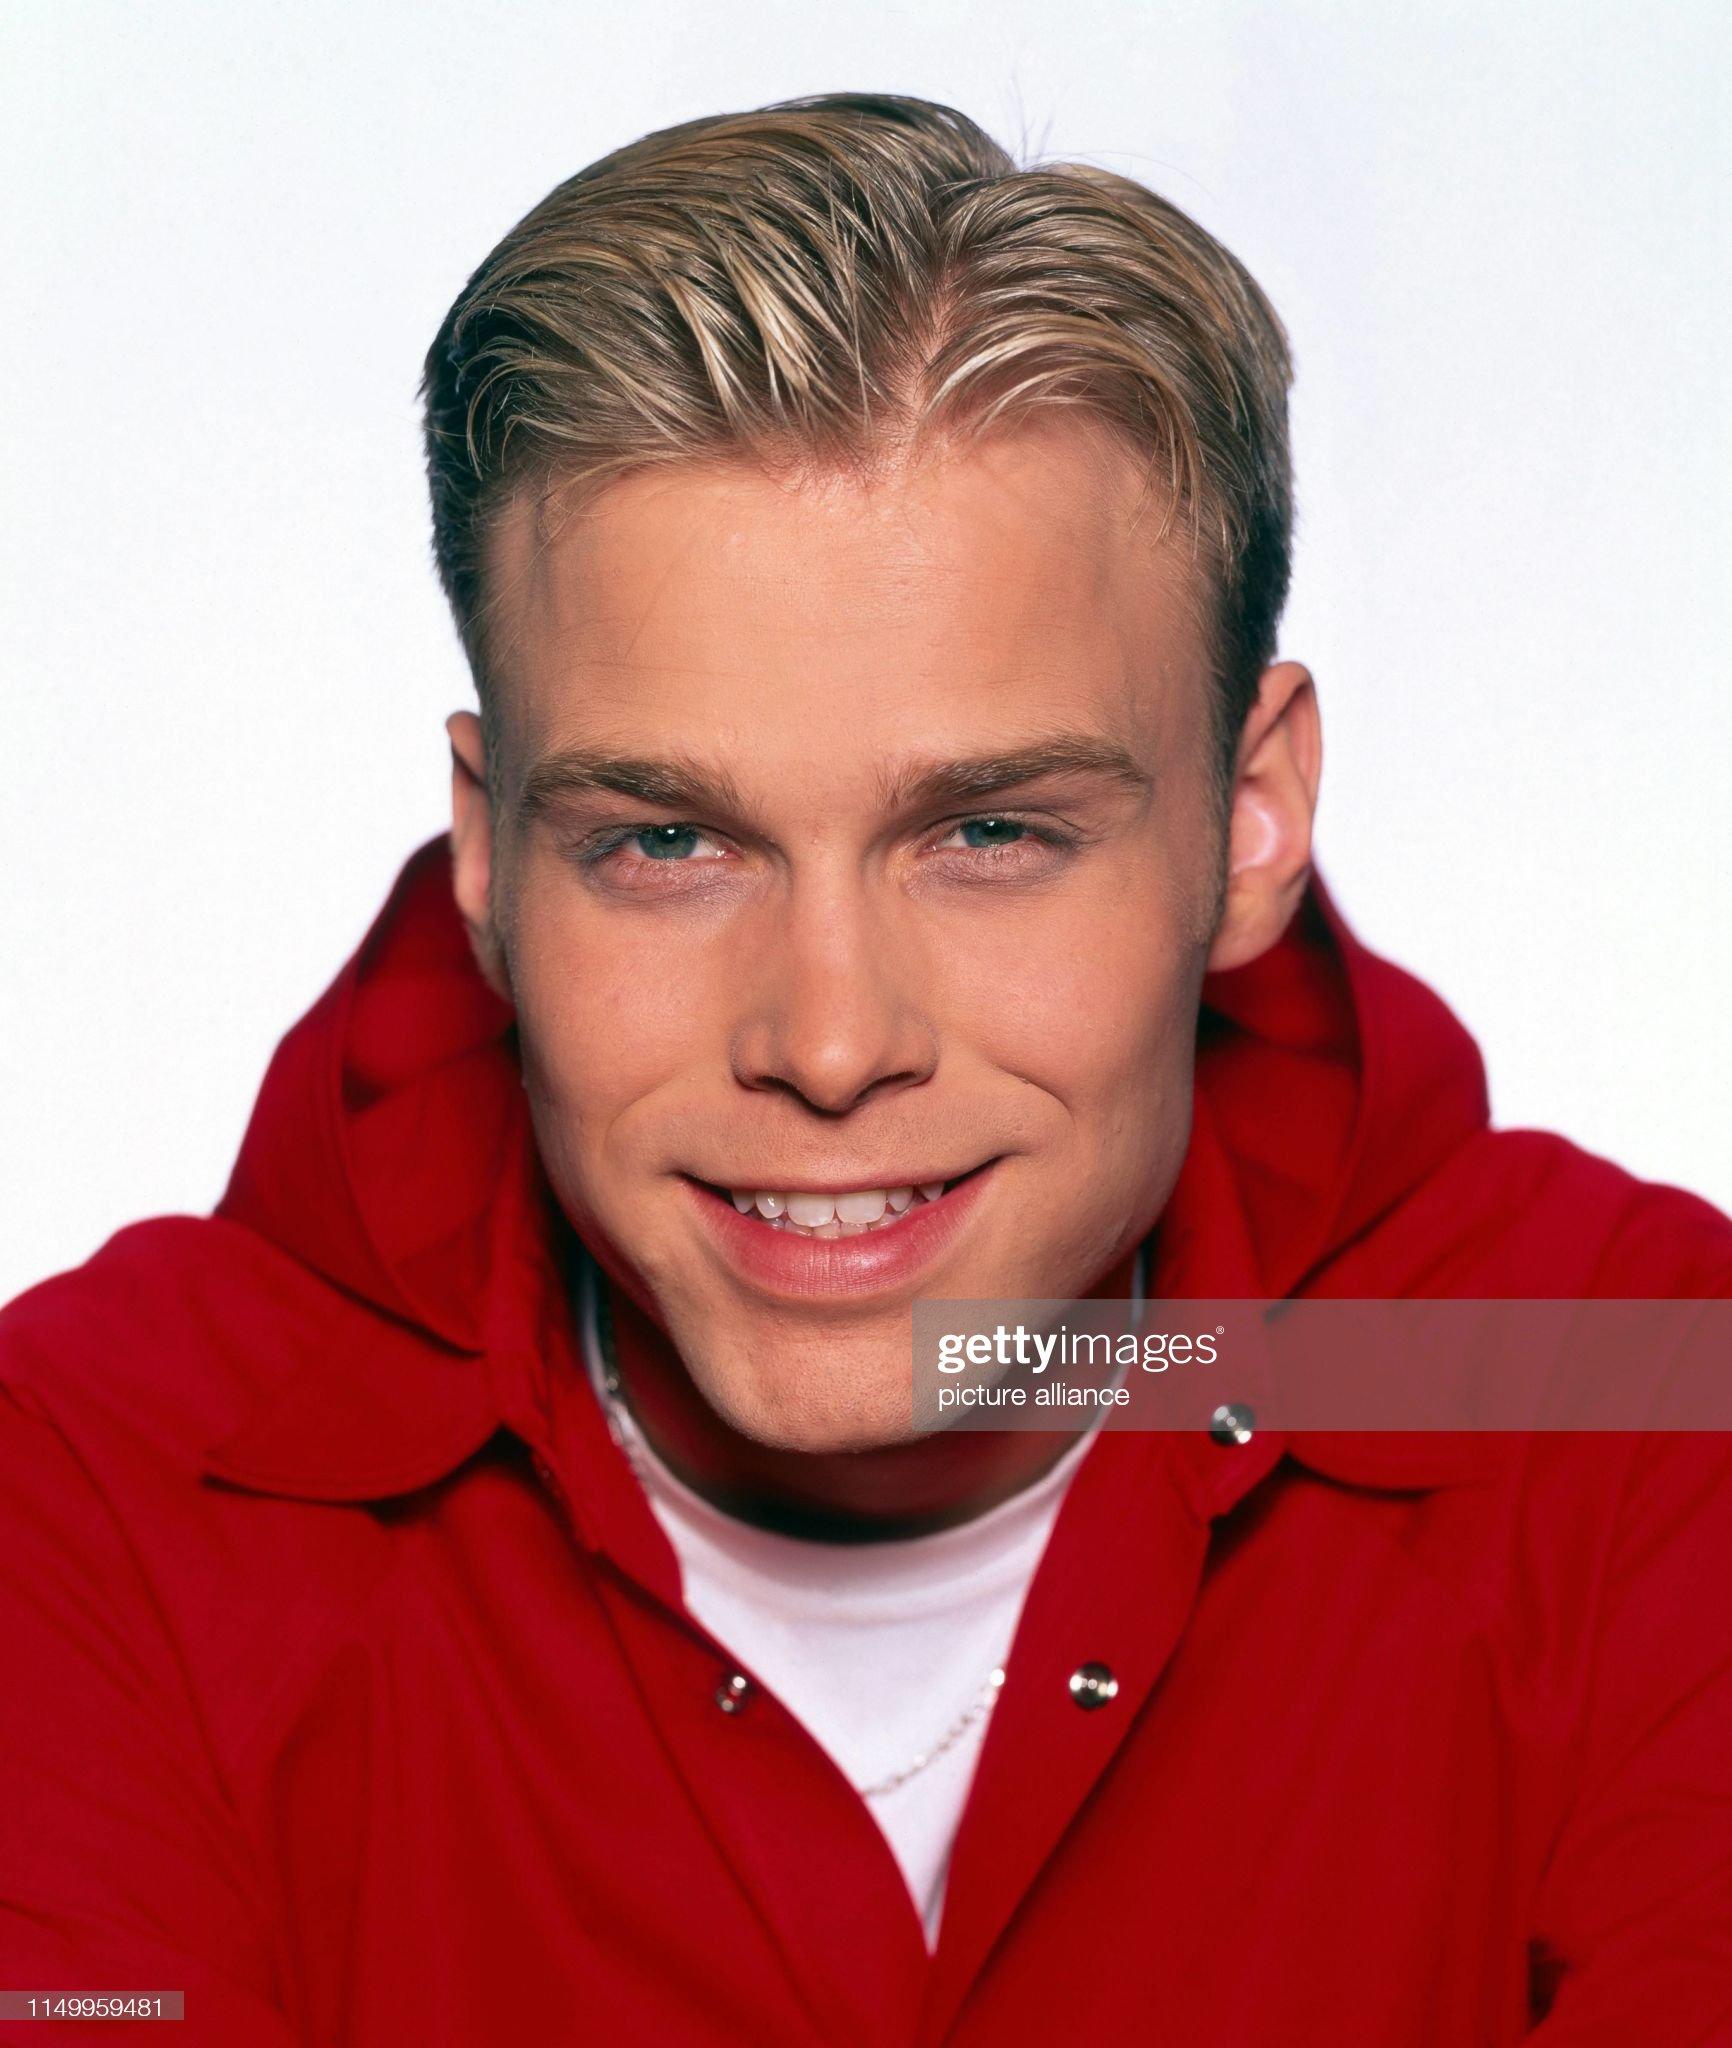 ¿Cuánto mide Christian Ingebrigtsen? - Real height Christian-ingebrigtsen-von-a1-britische-boyband-in-kln-deutschland-picture-id1149959481?s=2048x2048